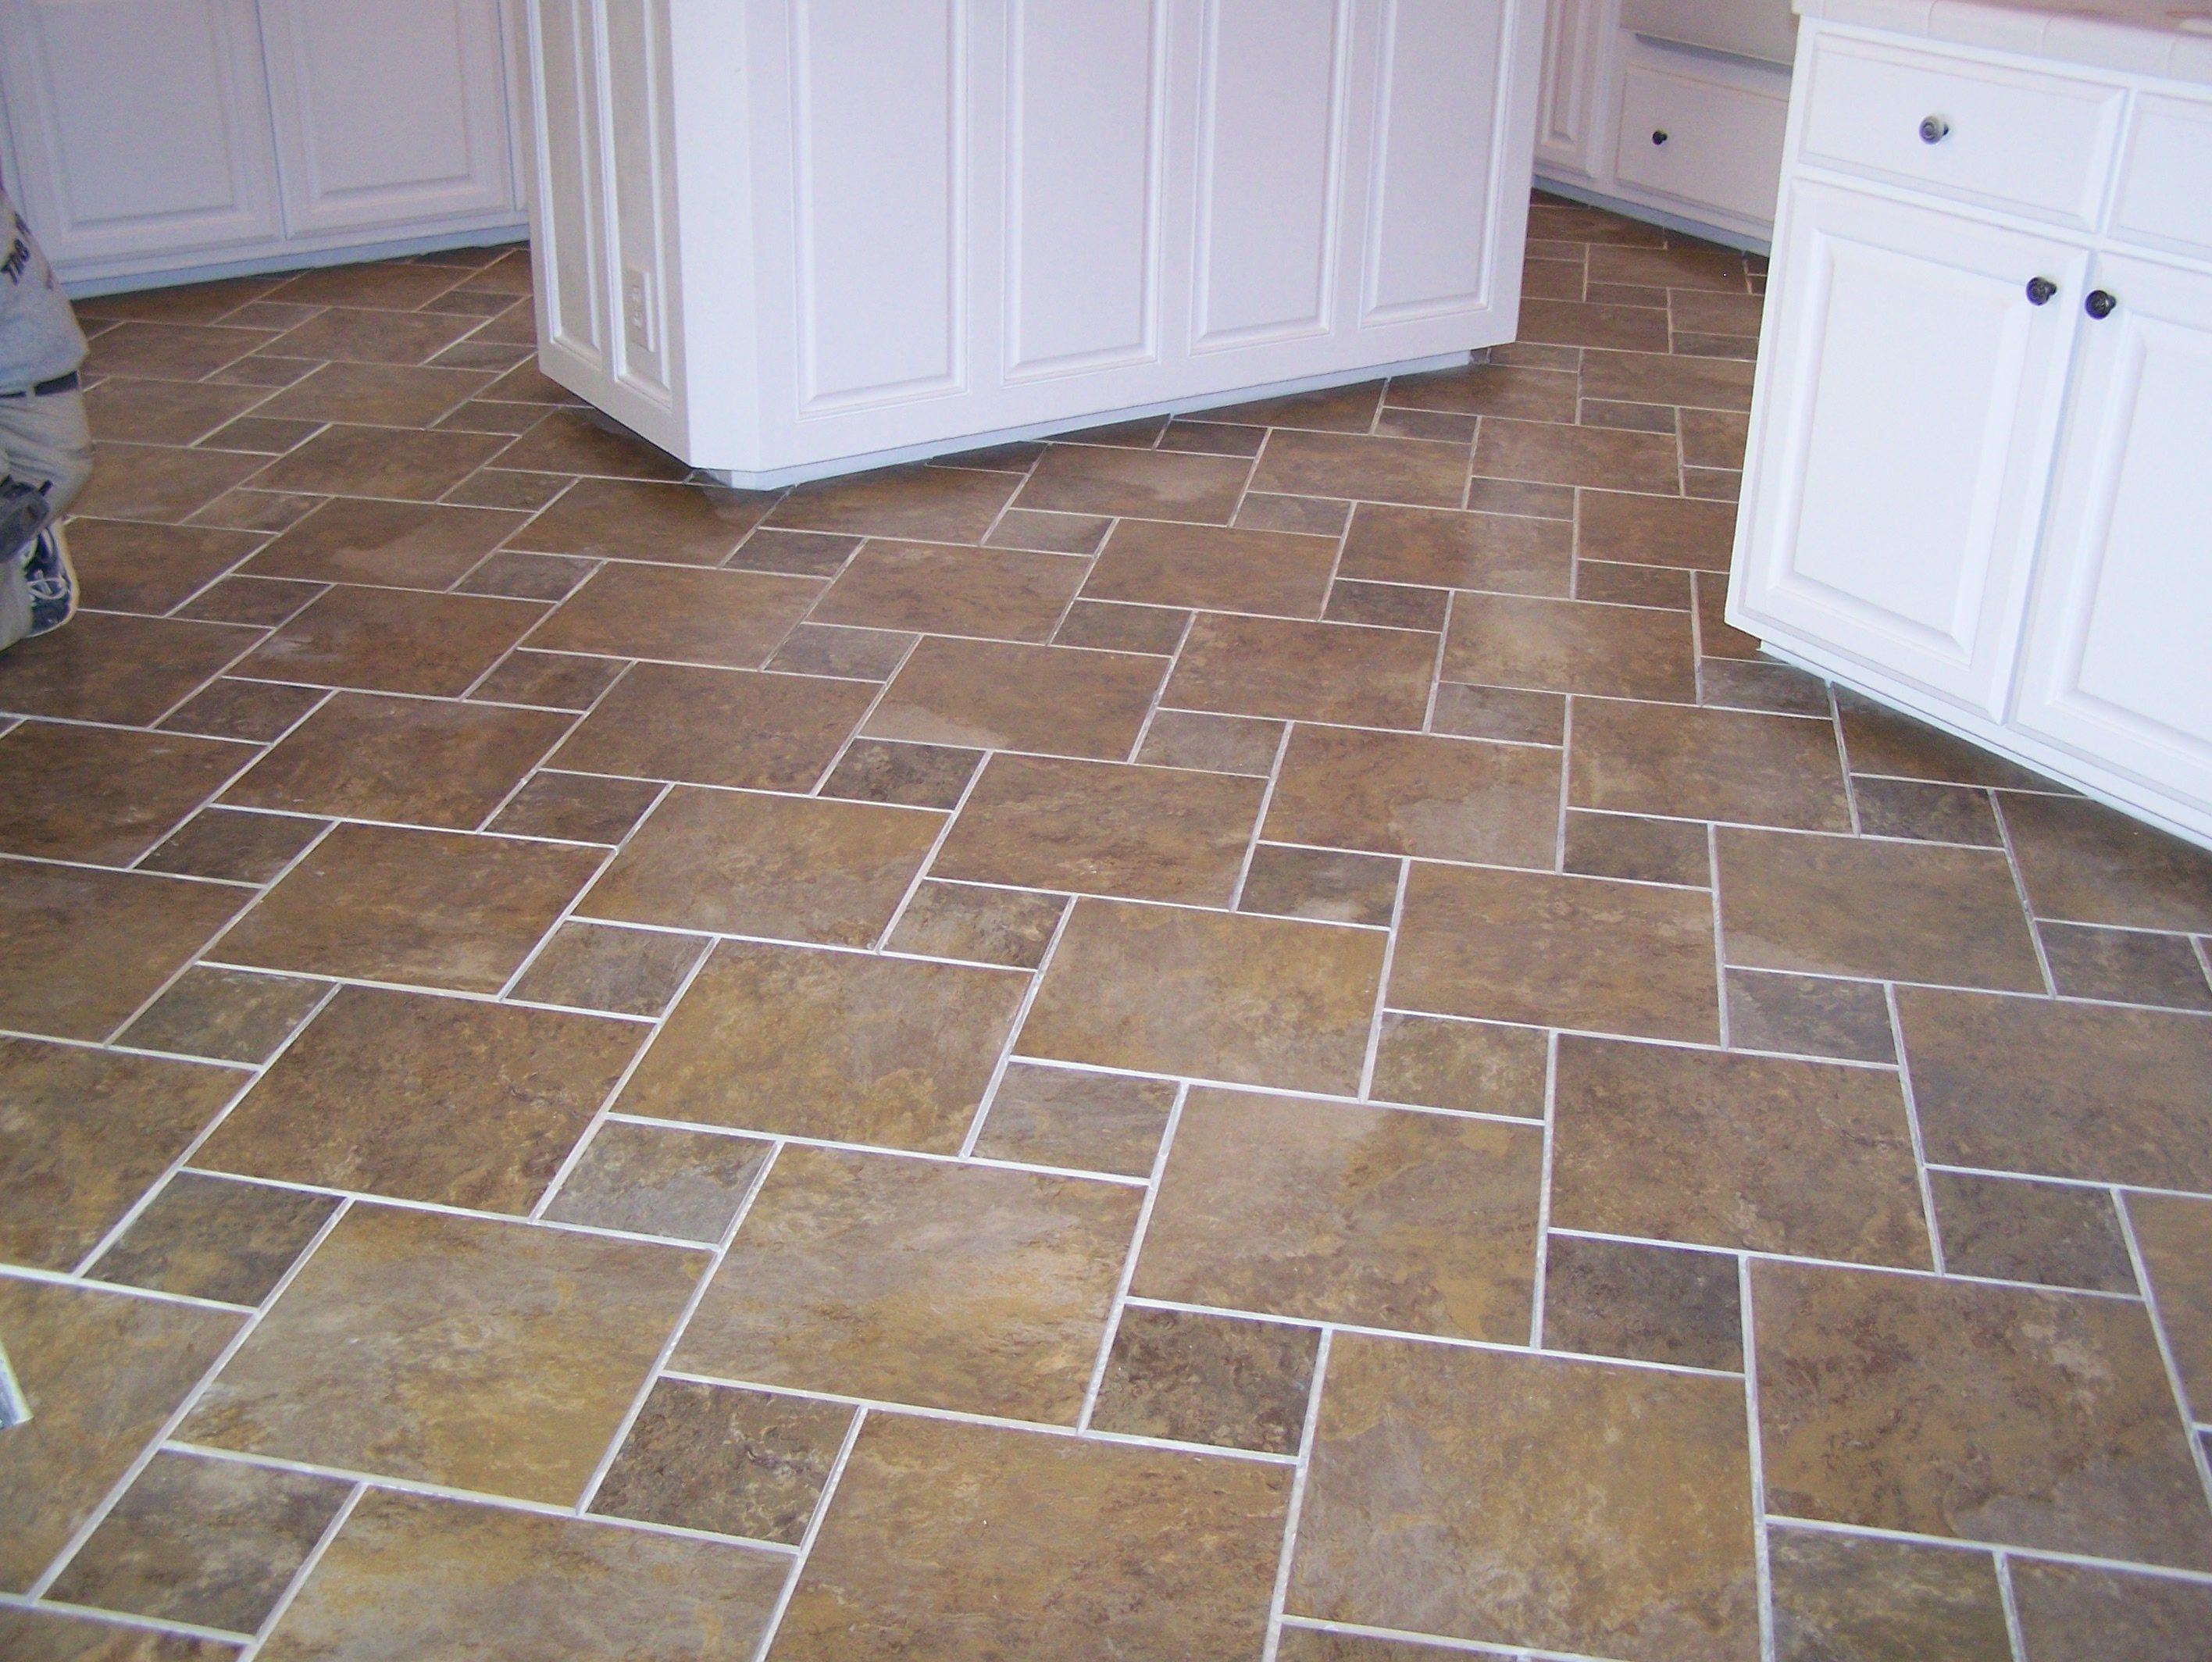 Ceramic Tile Floor Designsedition Chicago Edition Chicago Tile